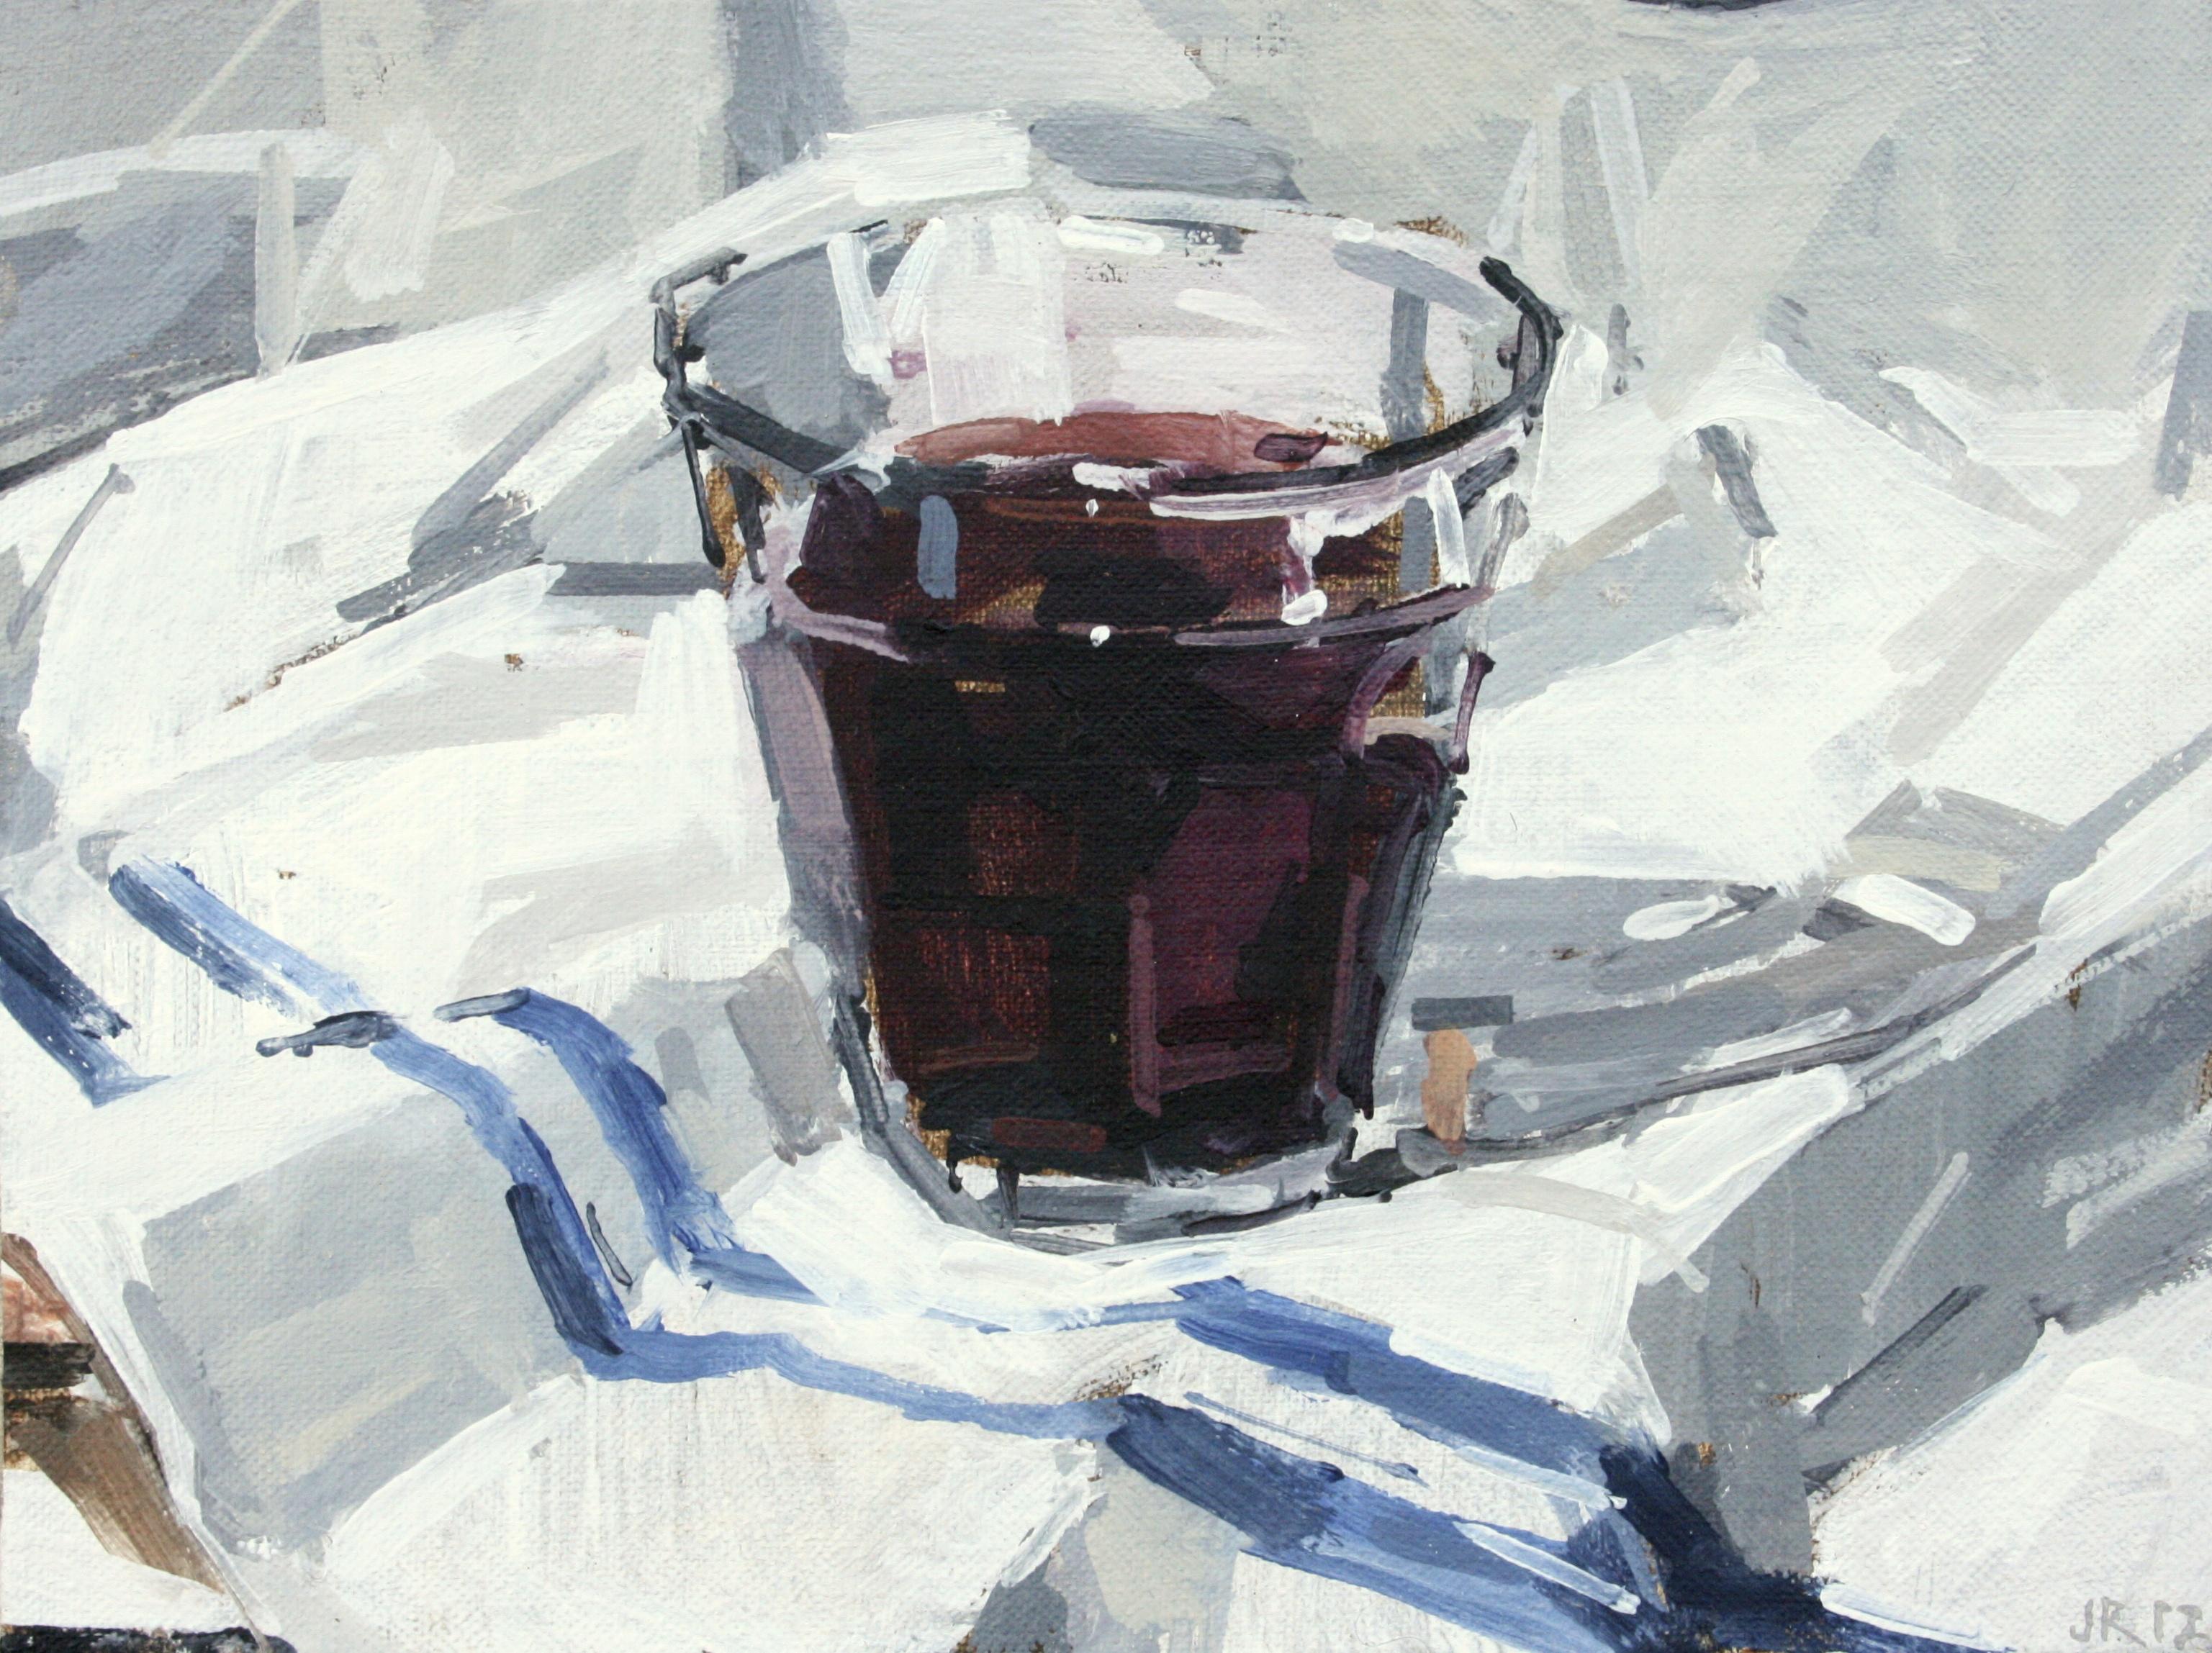 joseph ryan artist painter still life wine glass